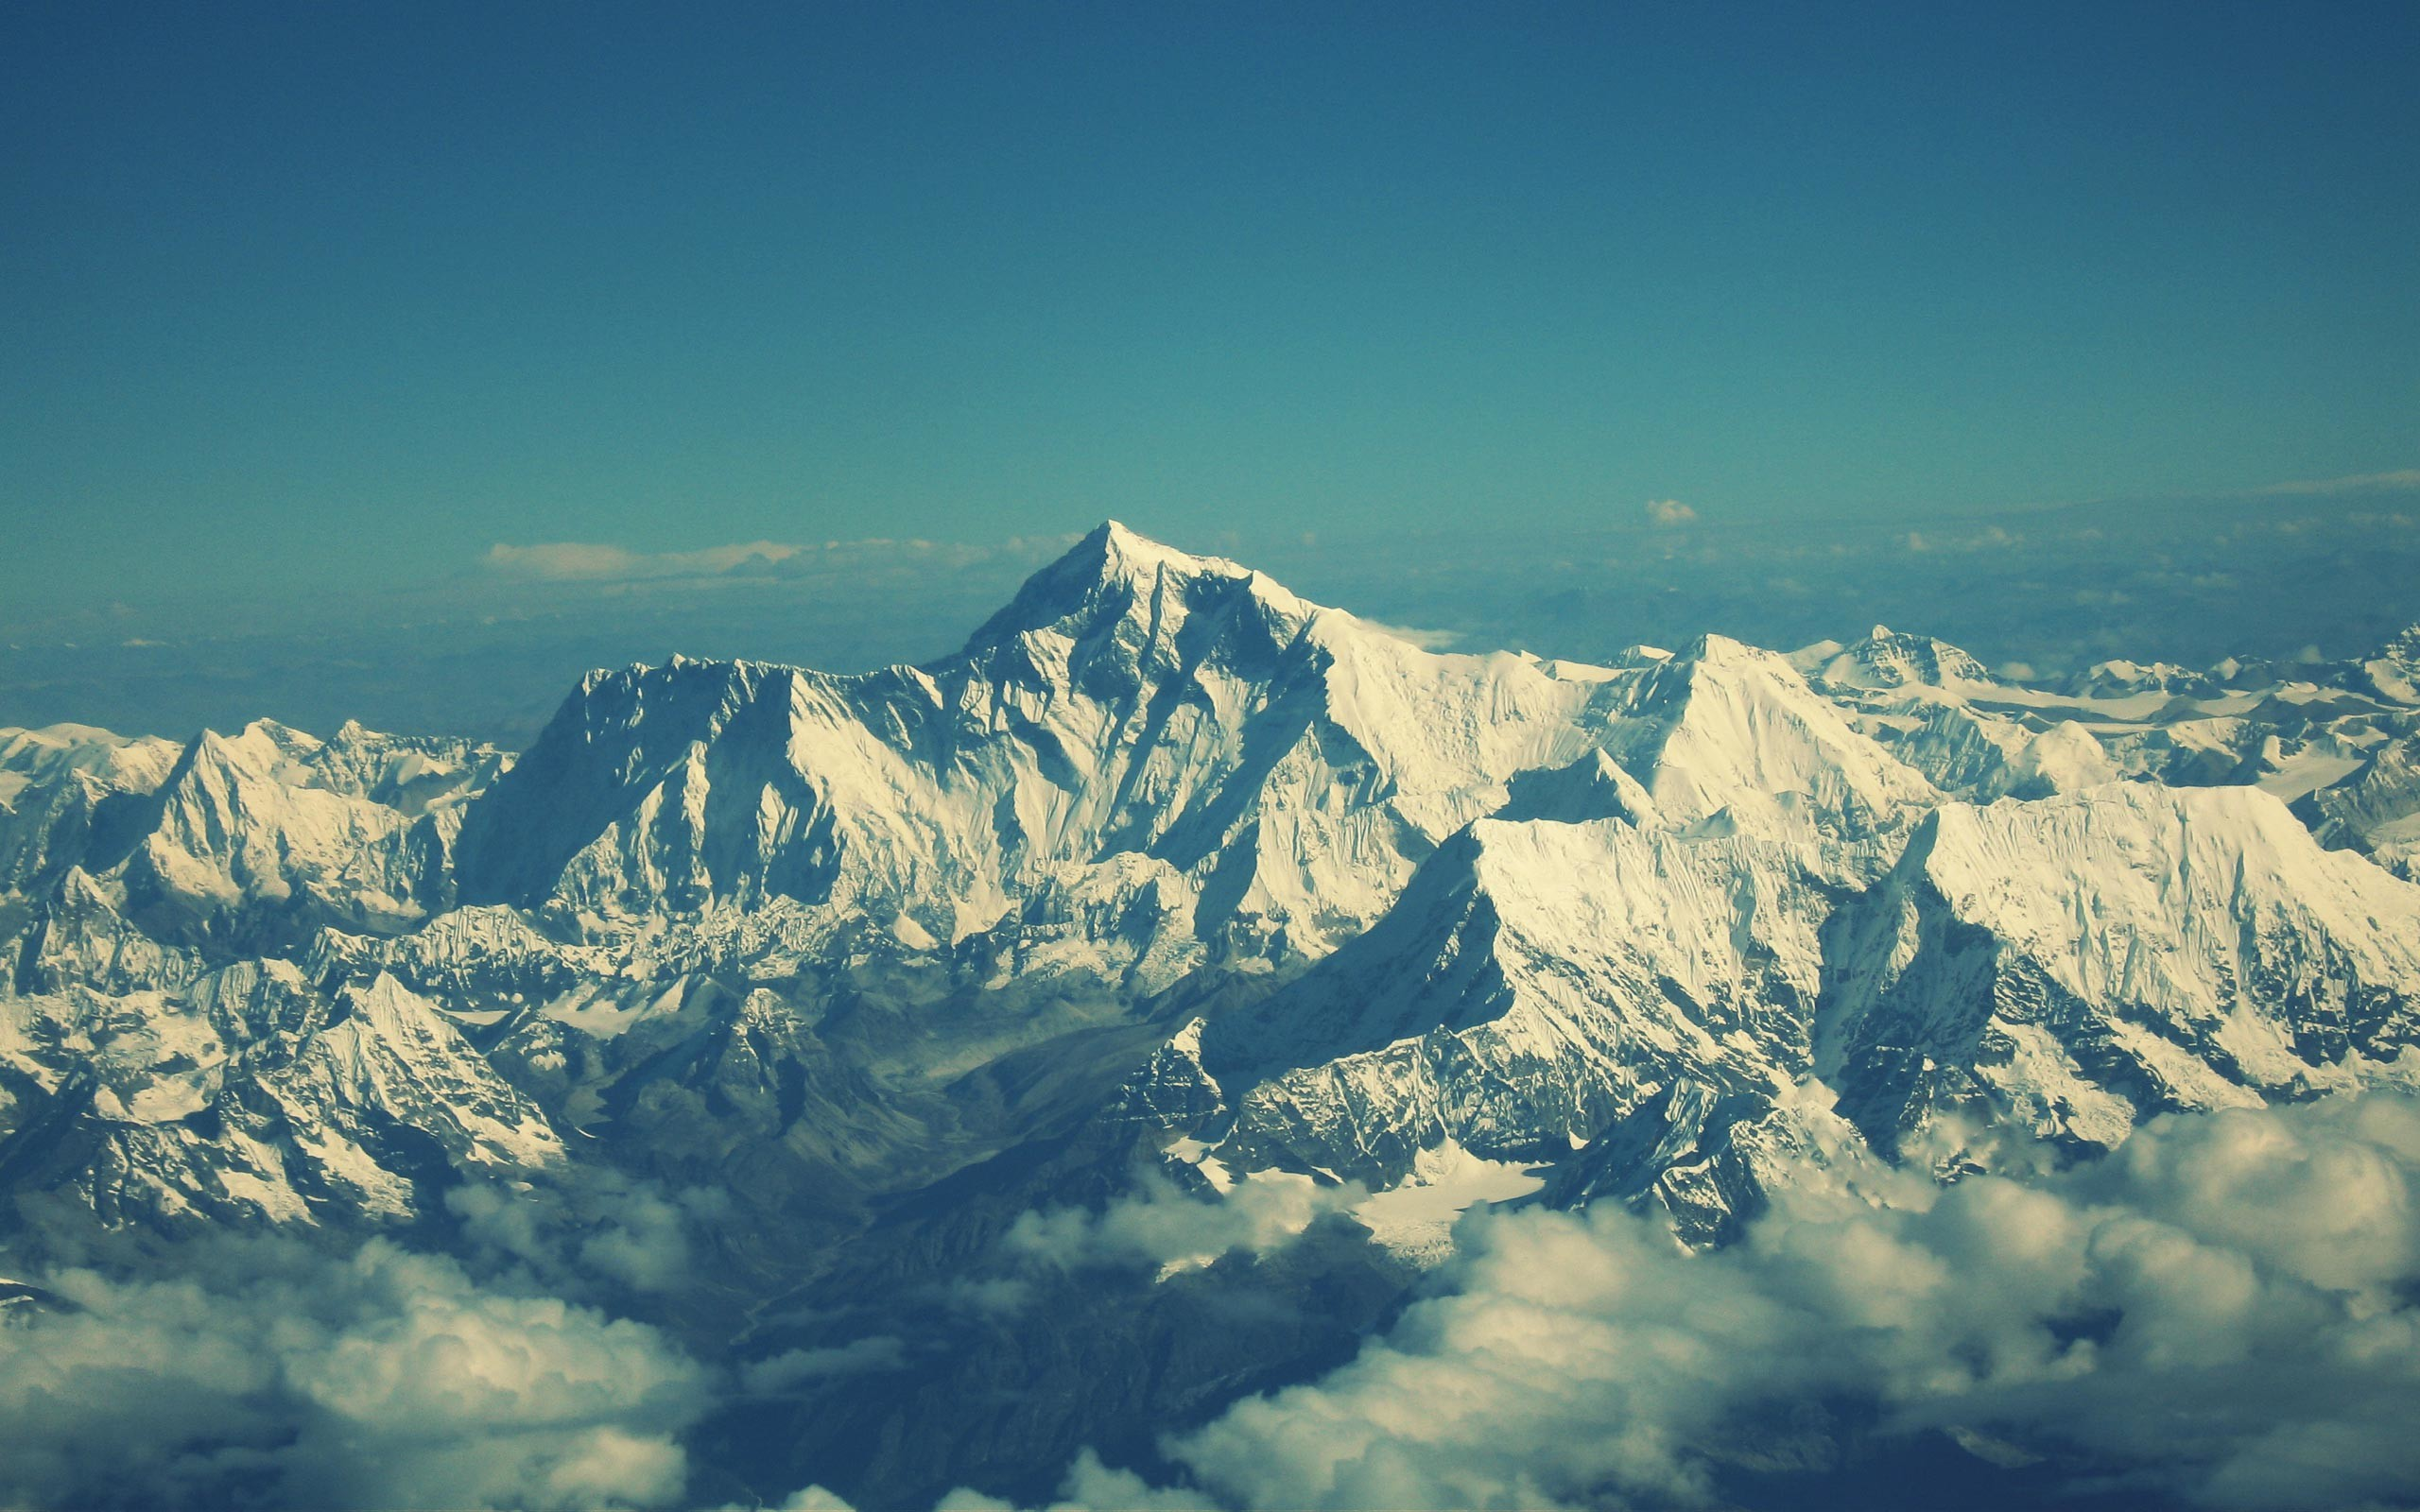 Free Snow Mountain Wallpaper for Desktop